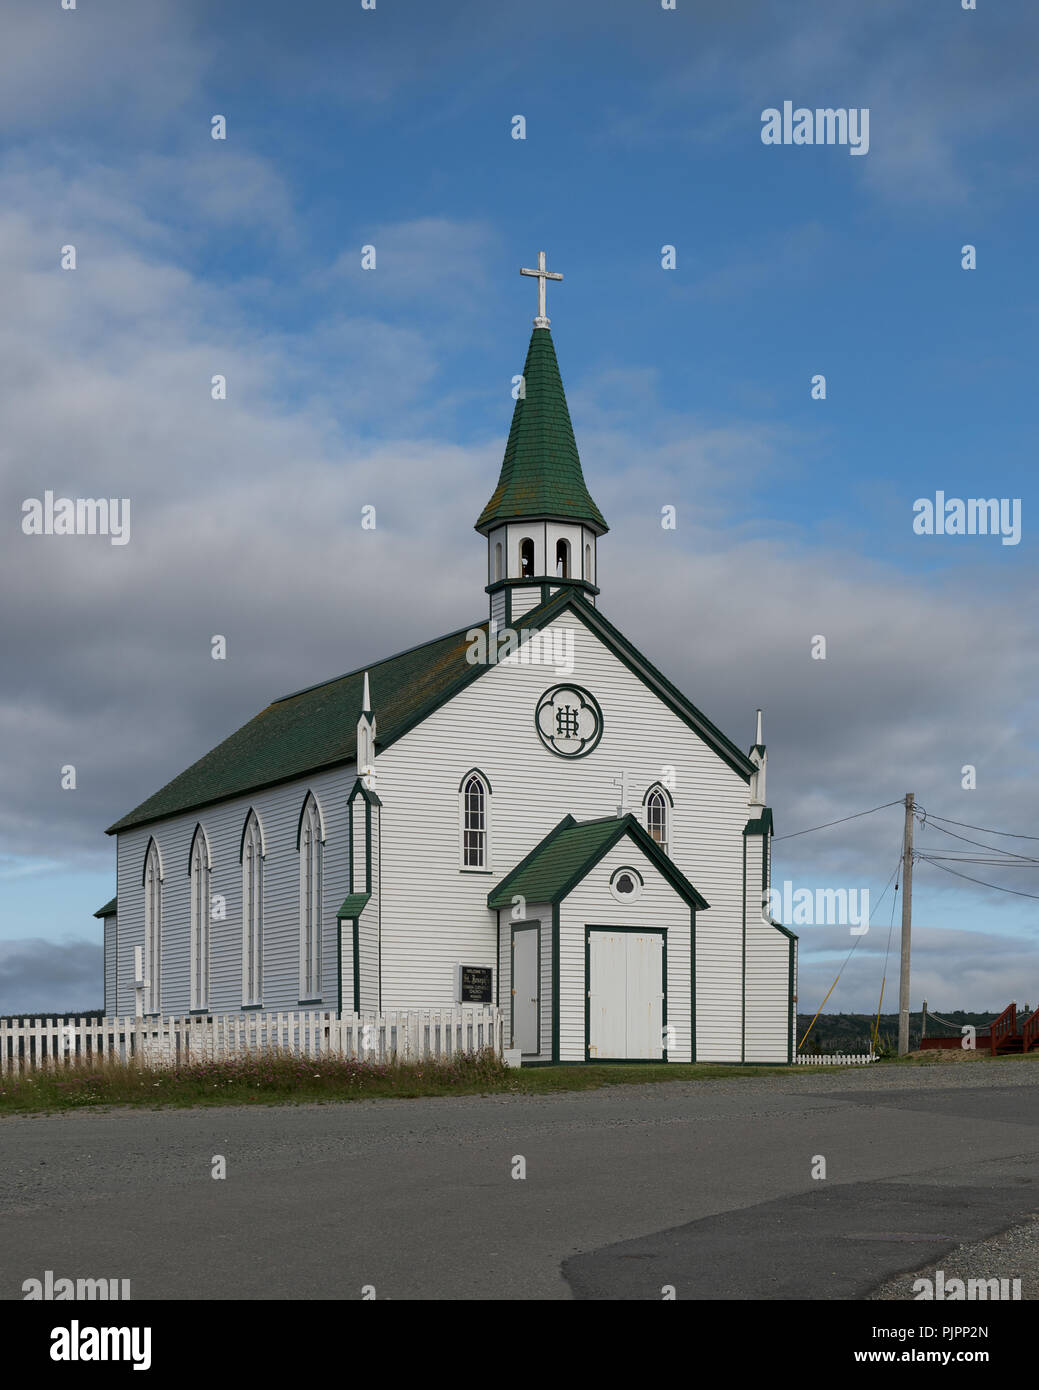 Exterior of the historic Saint Joseph's Roman Catholic Church on Chapel Hill in Bonavista, Newfoundland and Labrador - Stock Image